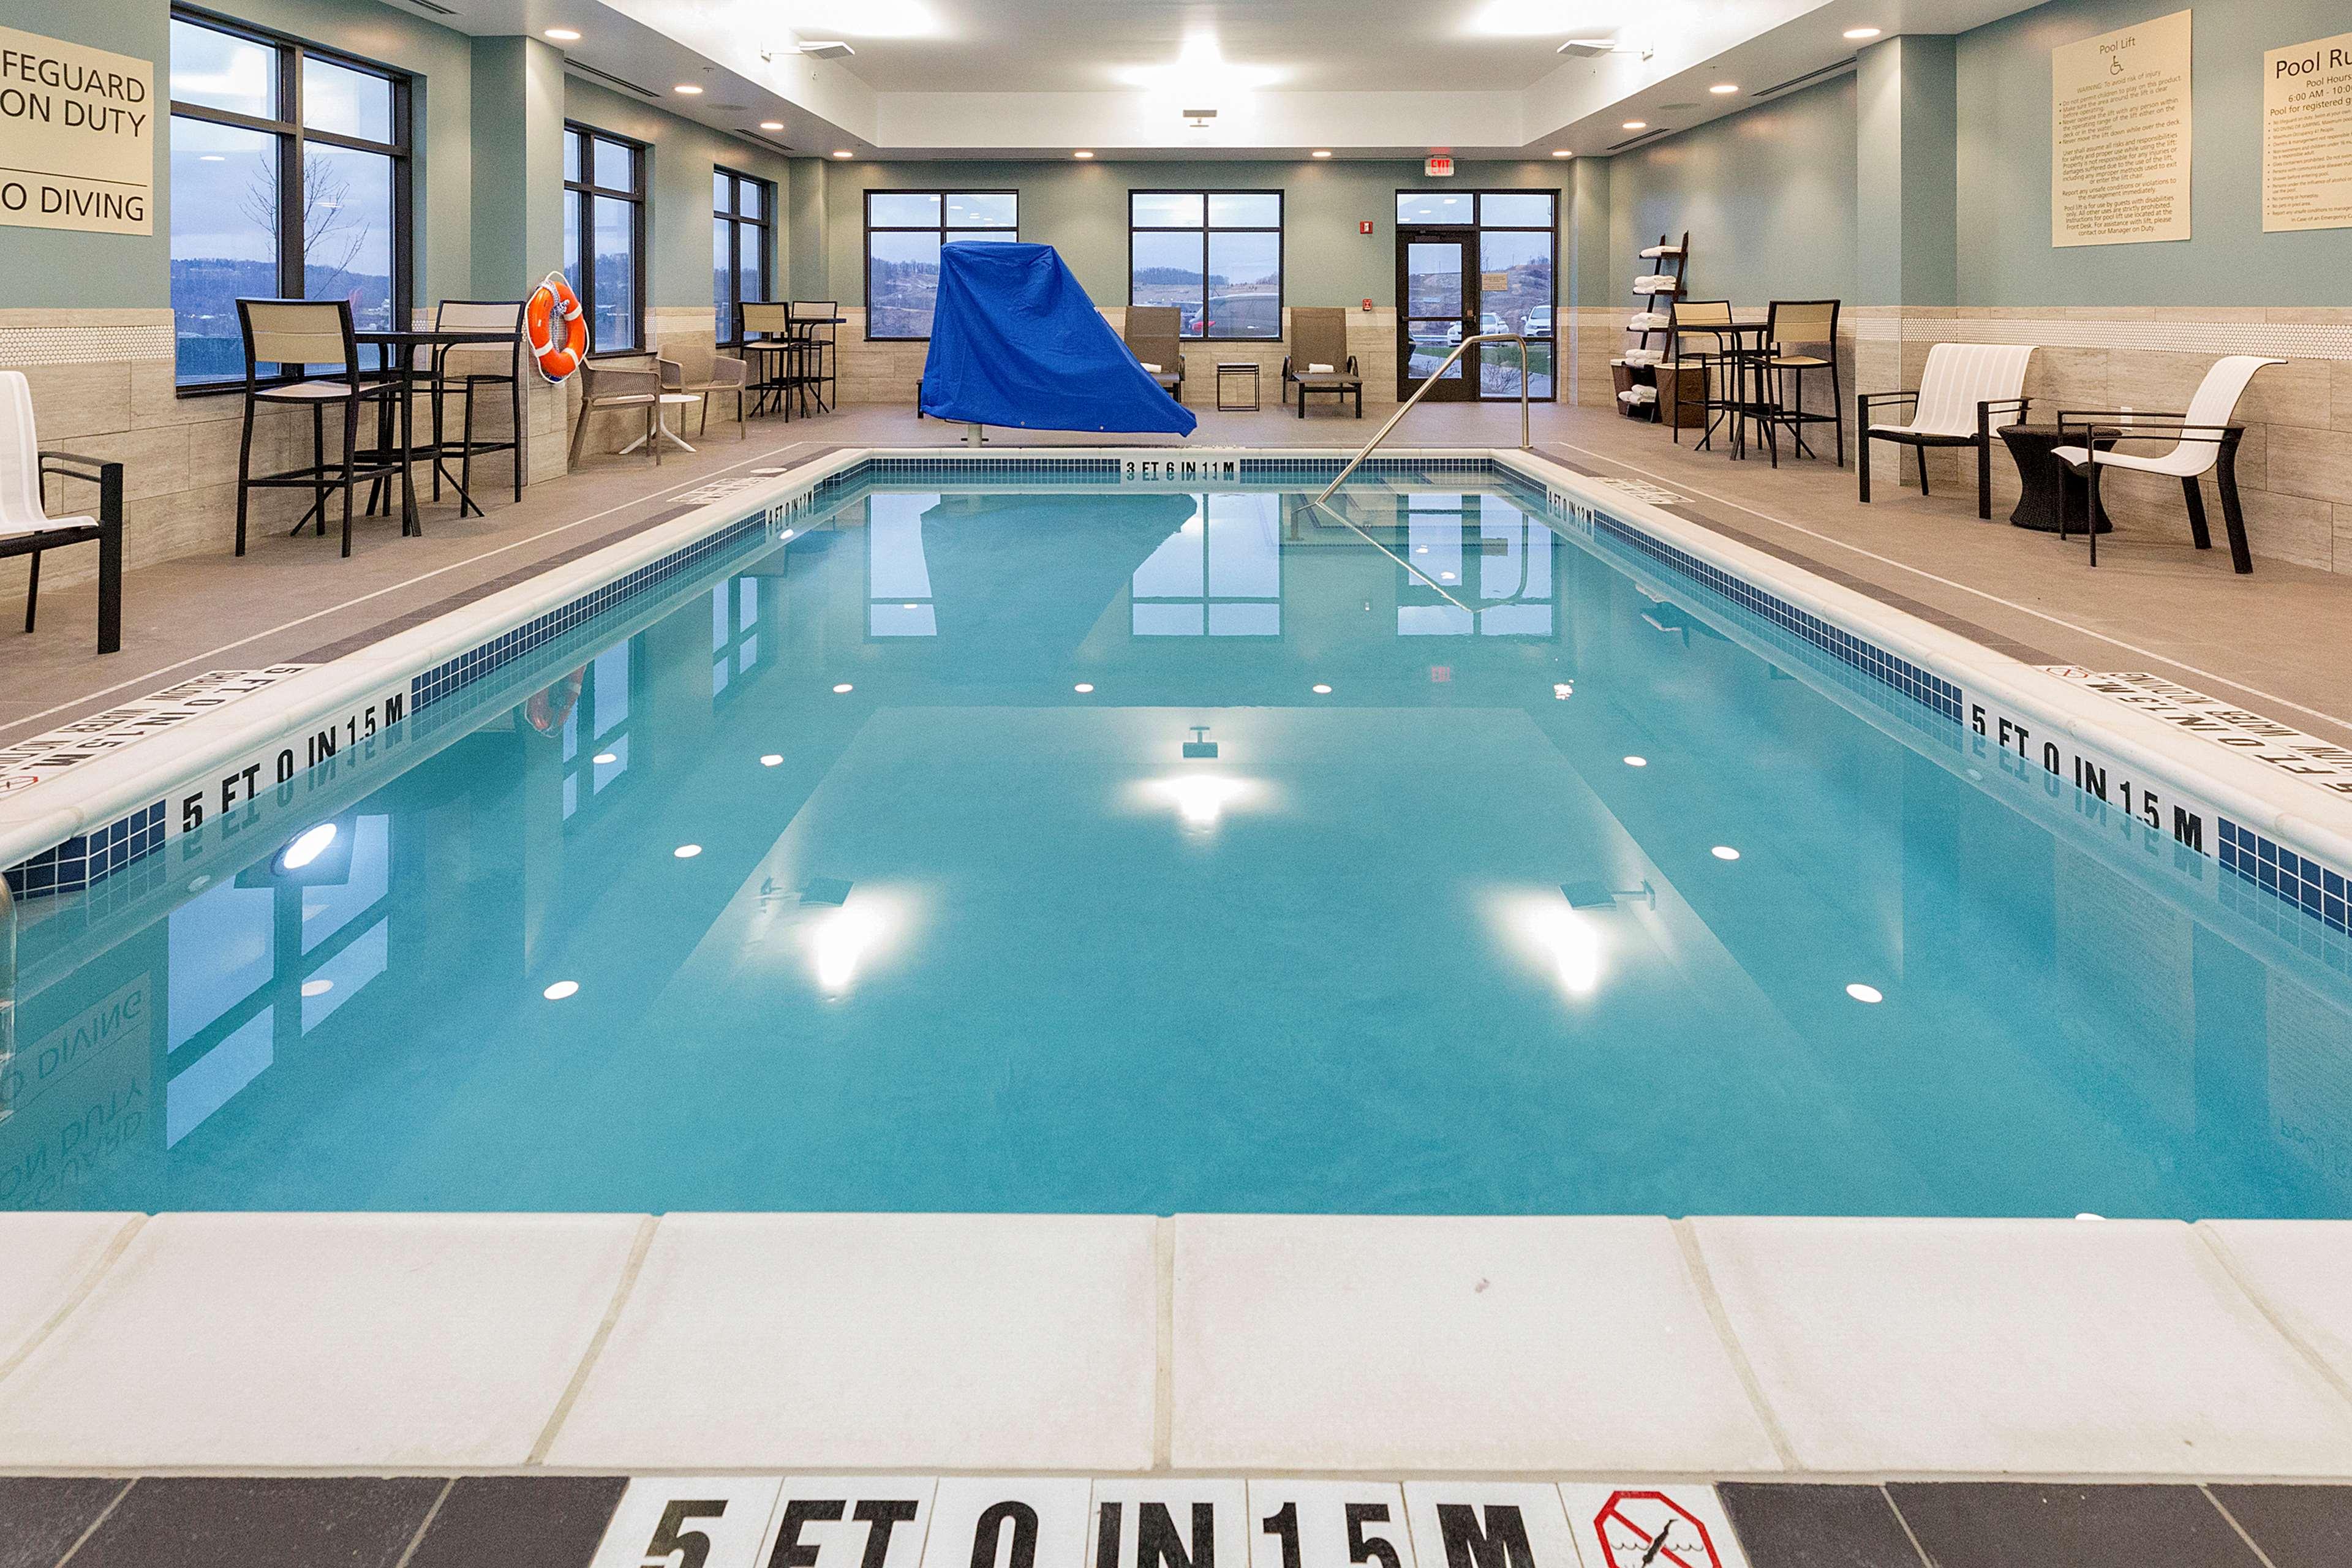 Hampton Inn & Suites Morgantown / University Town Centre image 7